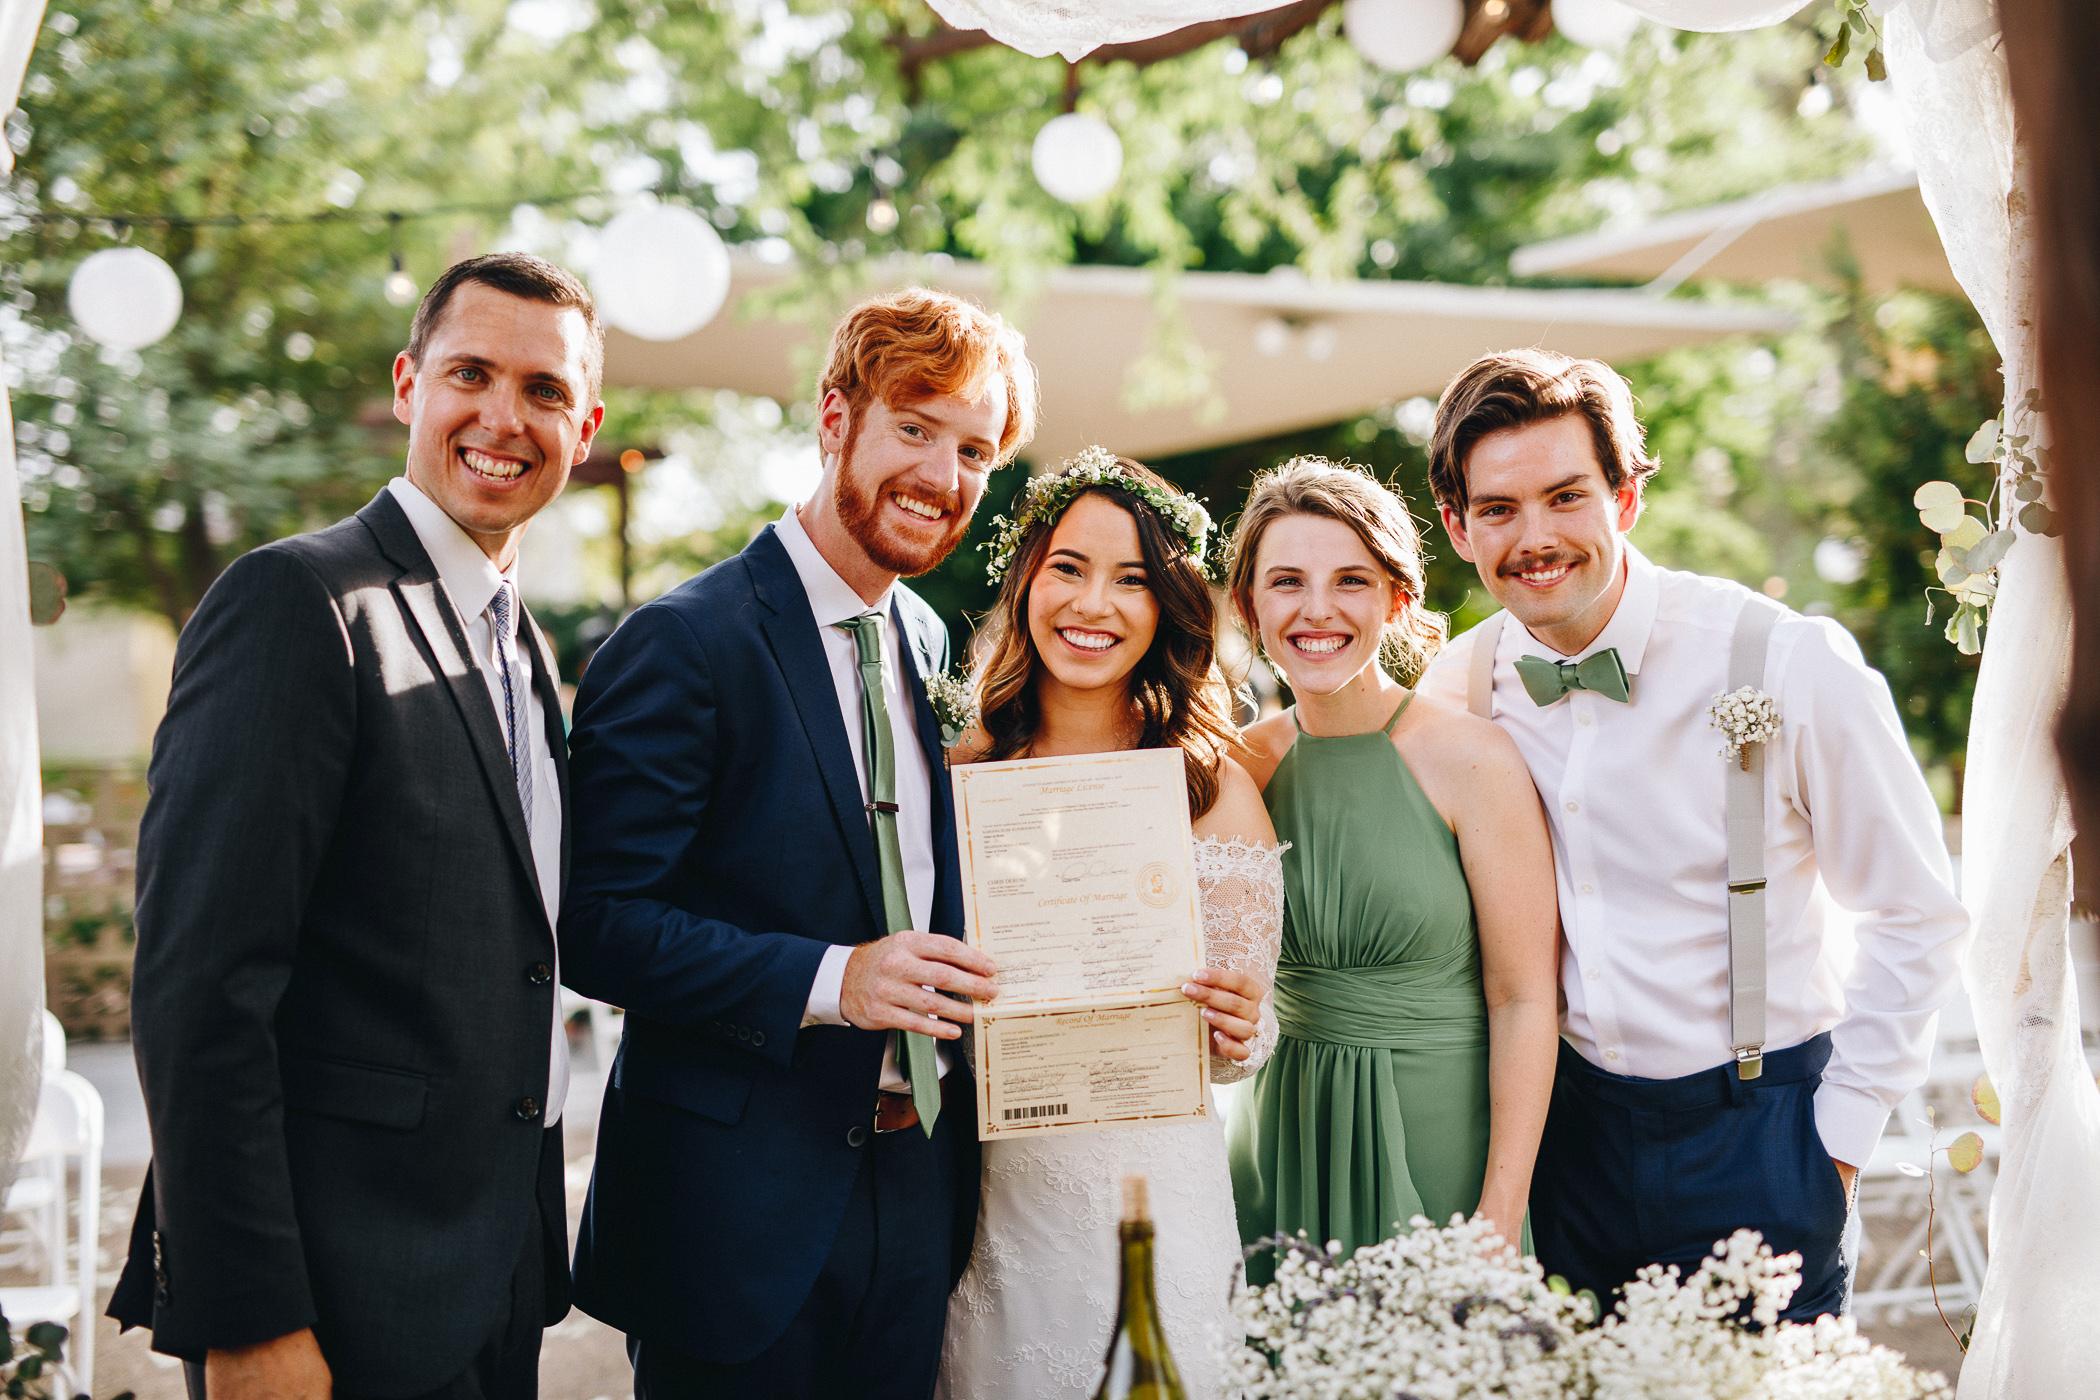 181104-Luxium-Weddings-Arizona-@matt__Le-Brandon-Kariana-Phoenix-Valley-Garden-Center-1075.jpg